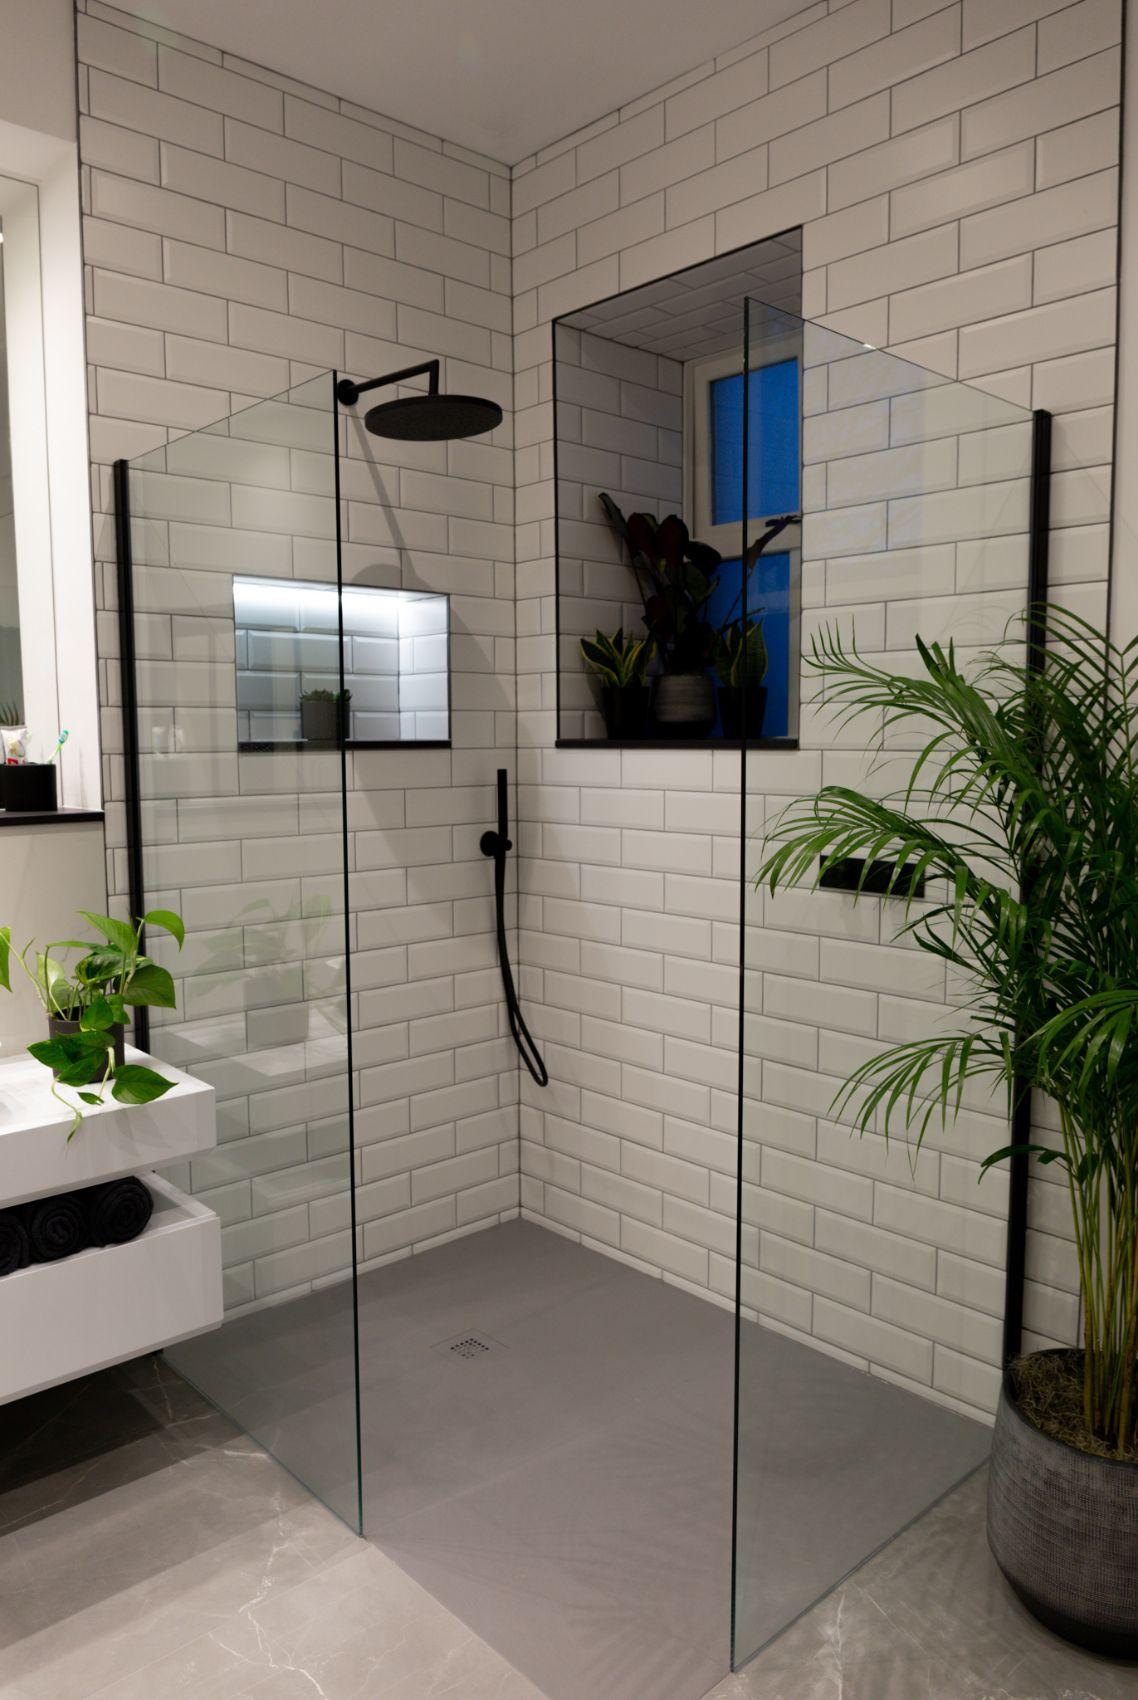 joes march bathroom portrait image shower